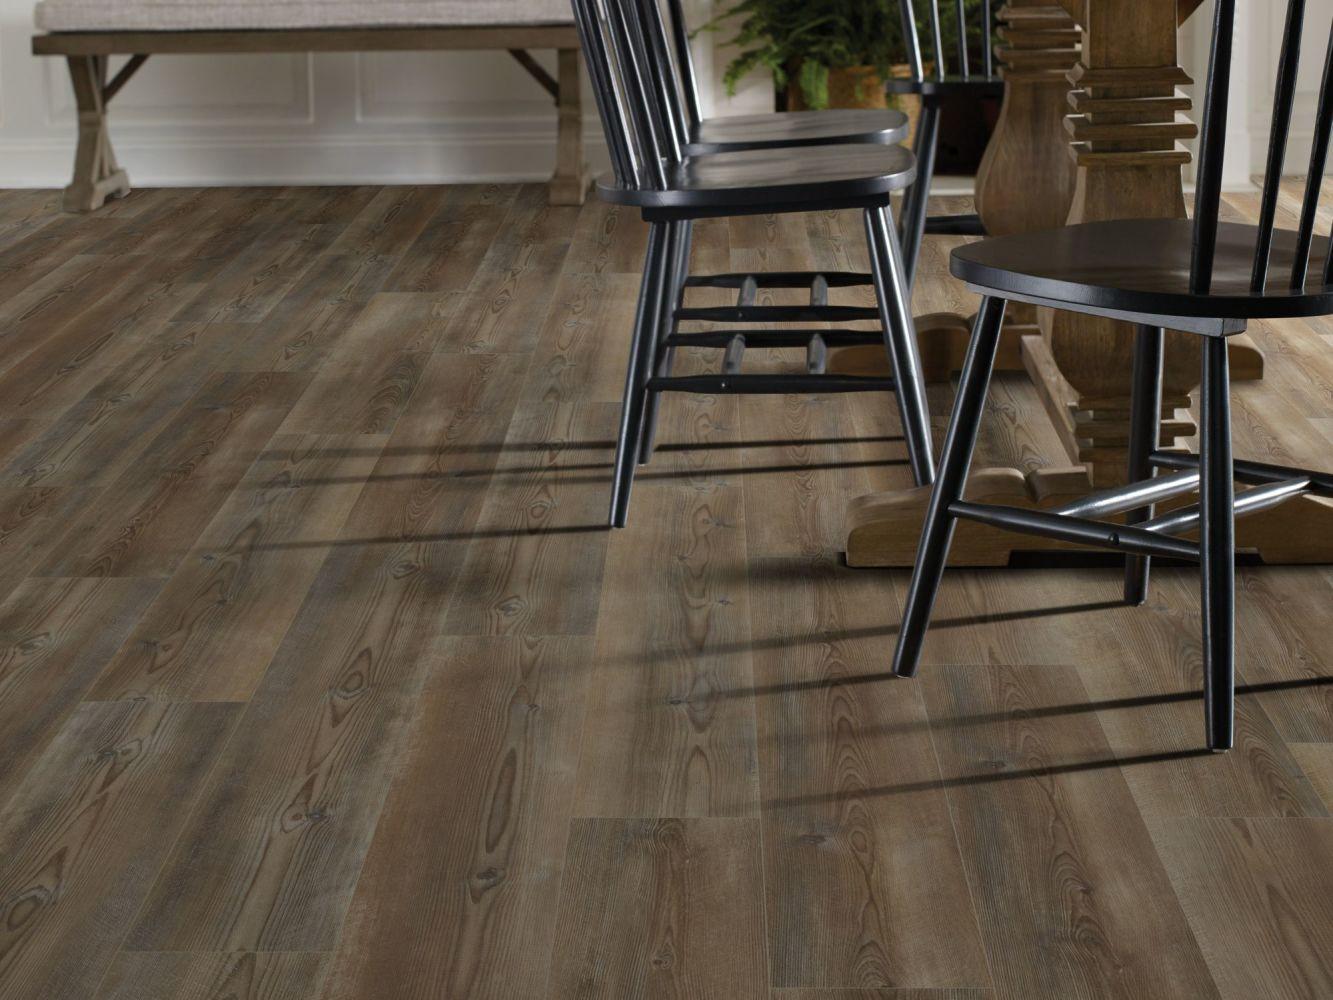 Shaw Floors Resilient Residential Grand Marais 7″ Ripped Pine 07047_507GA